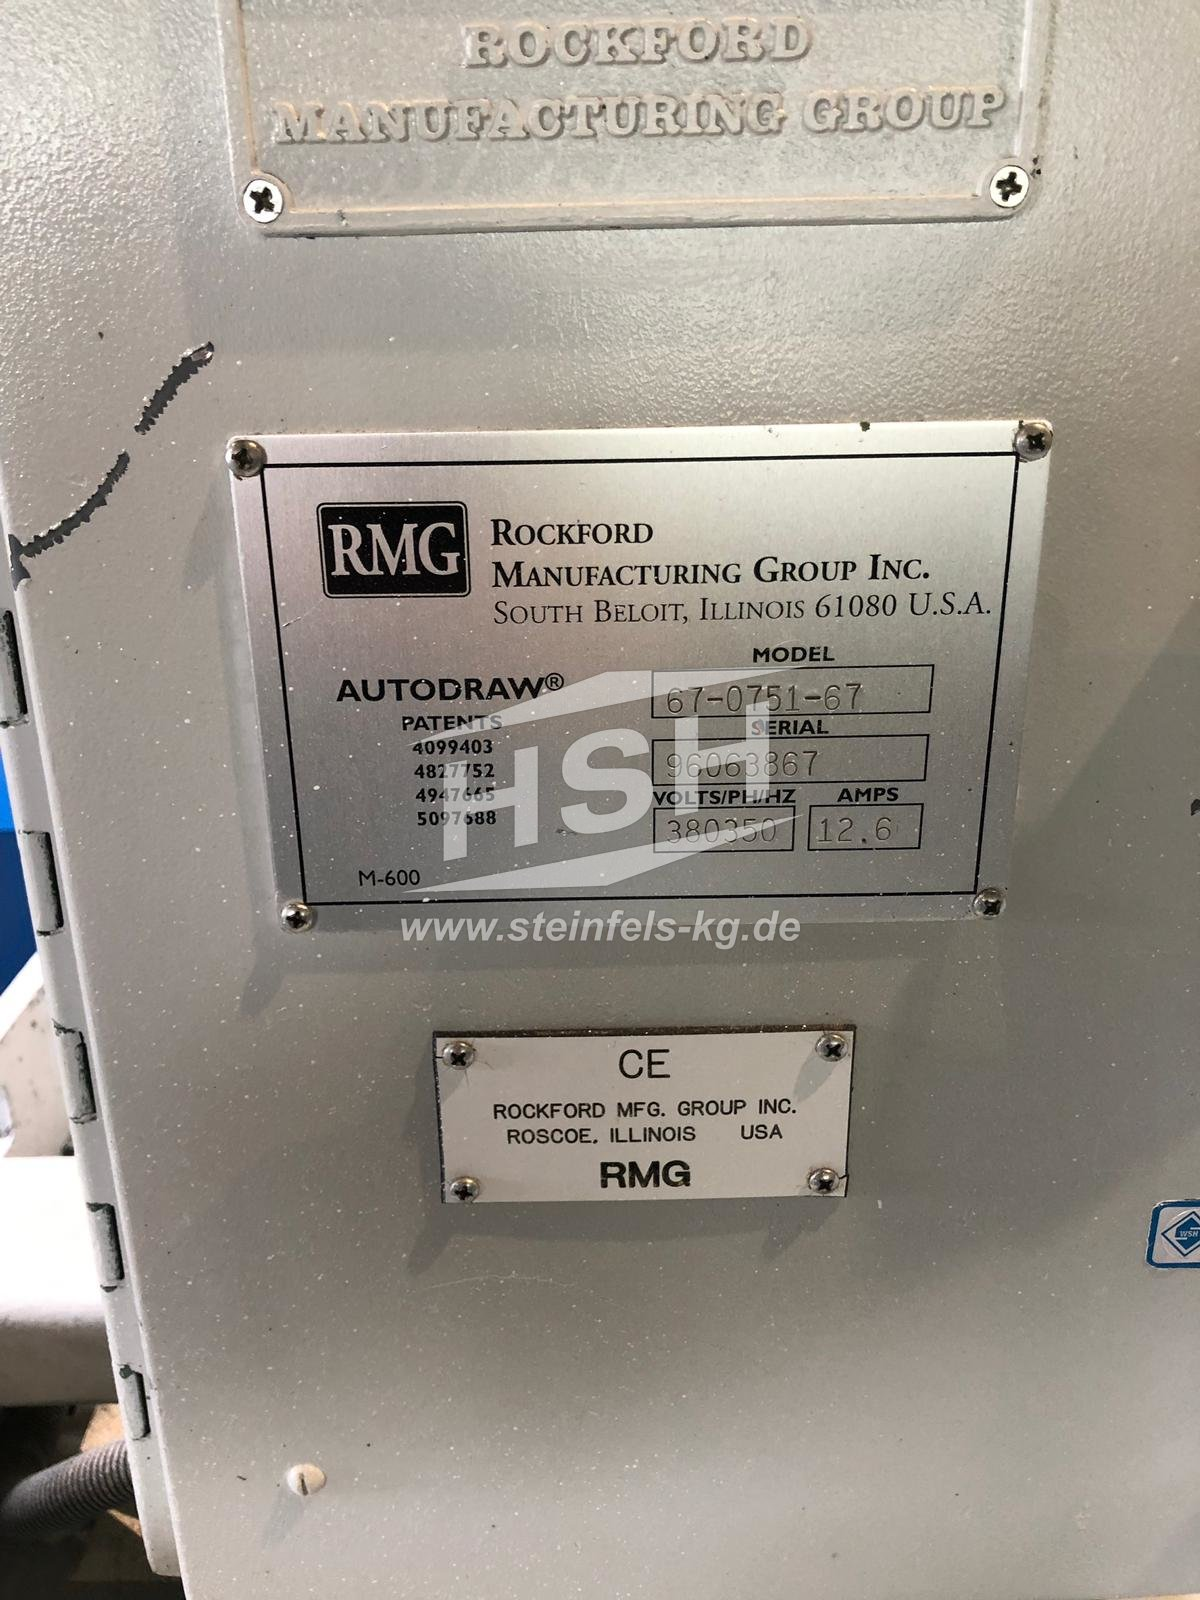 M38L/8167 – RMG – 67-0751-67 – 1996 – 11 mm